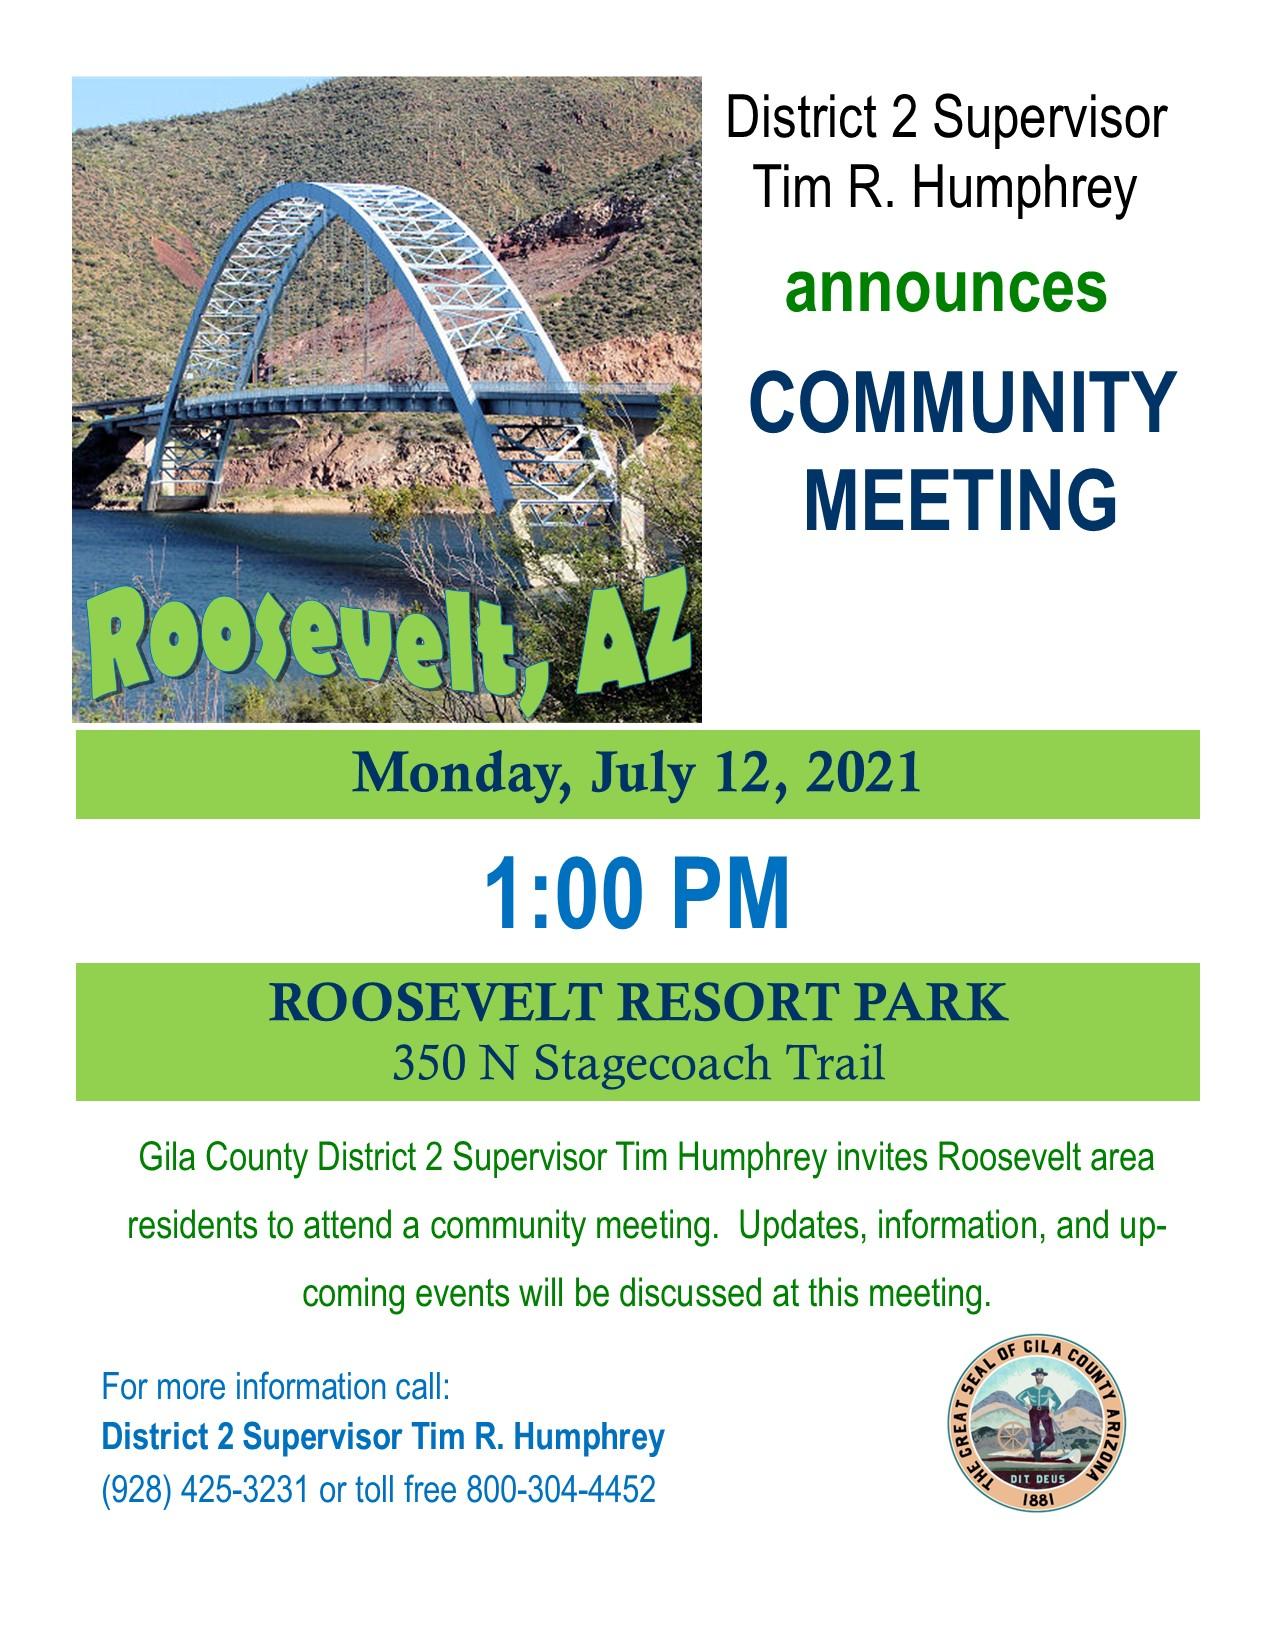 Roosevelt Community Meeting